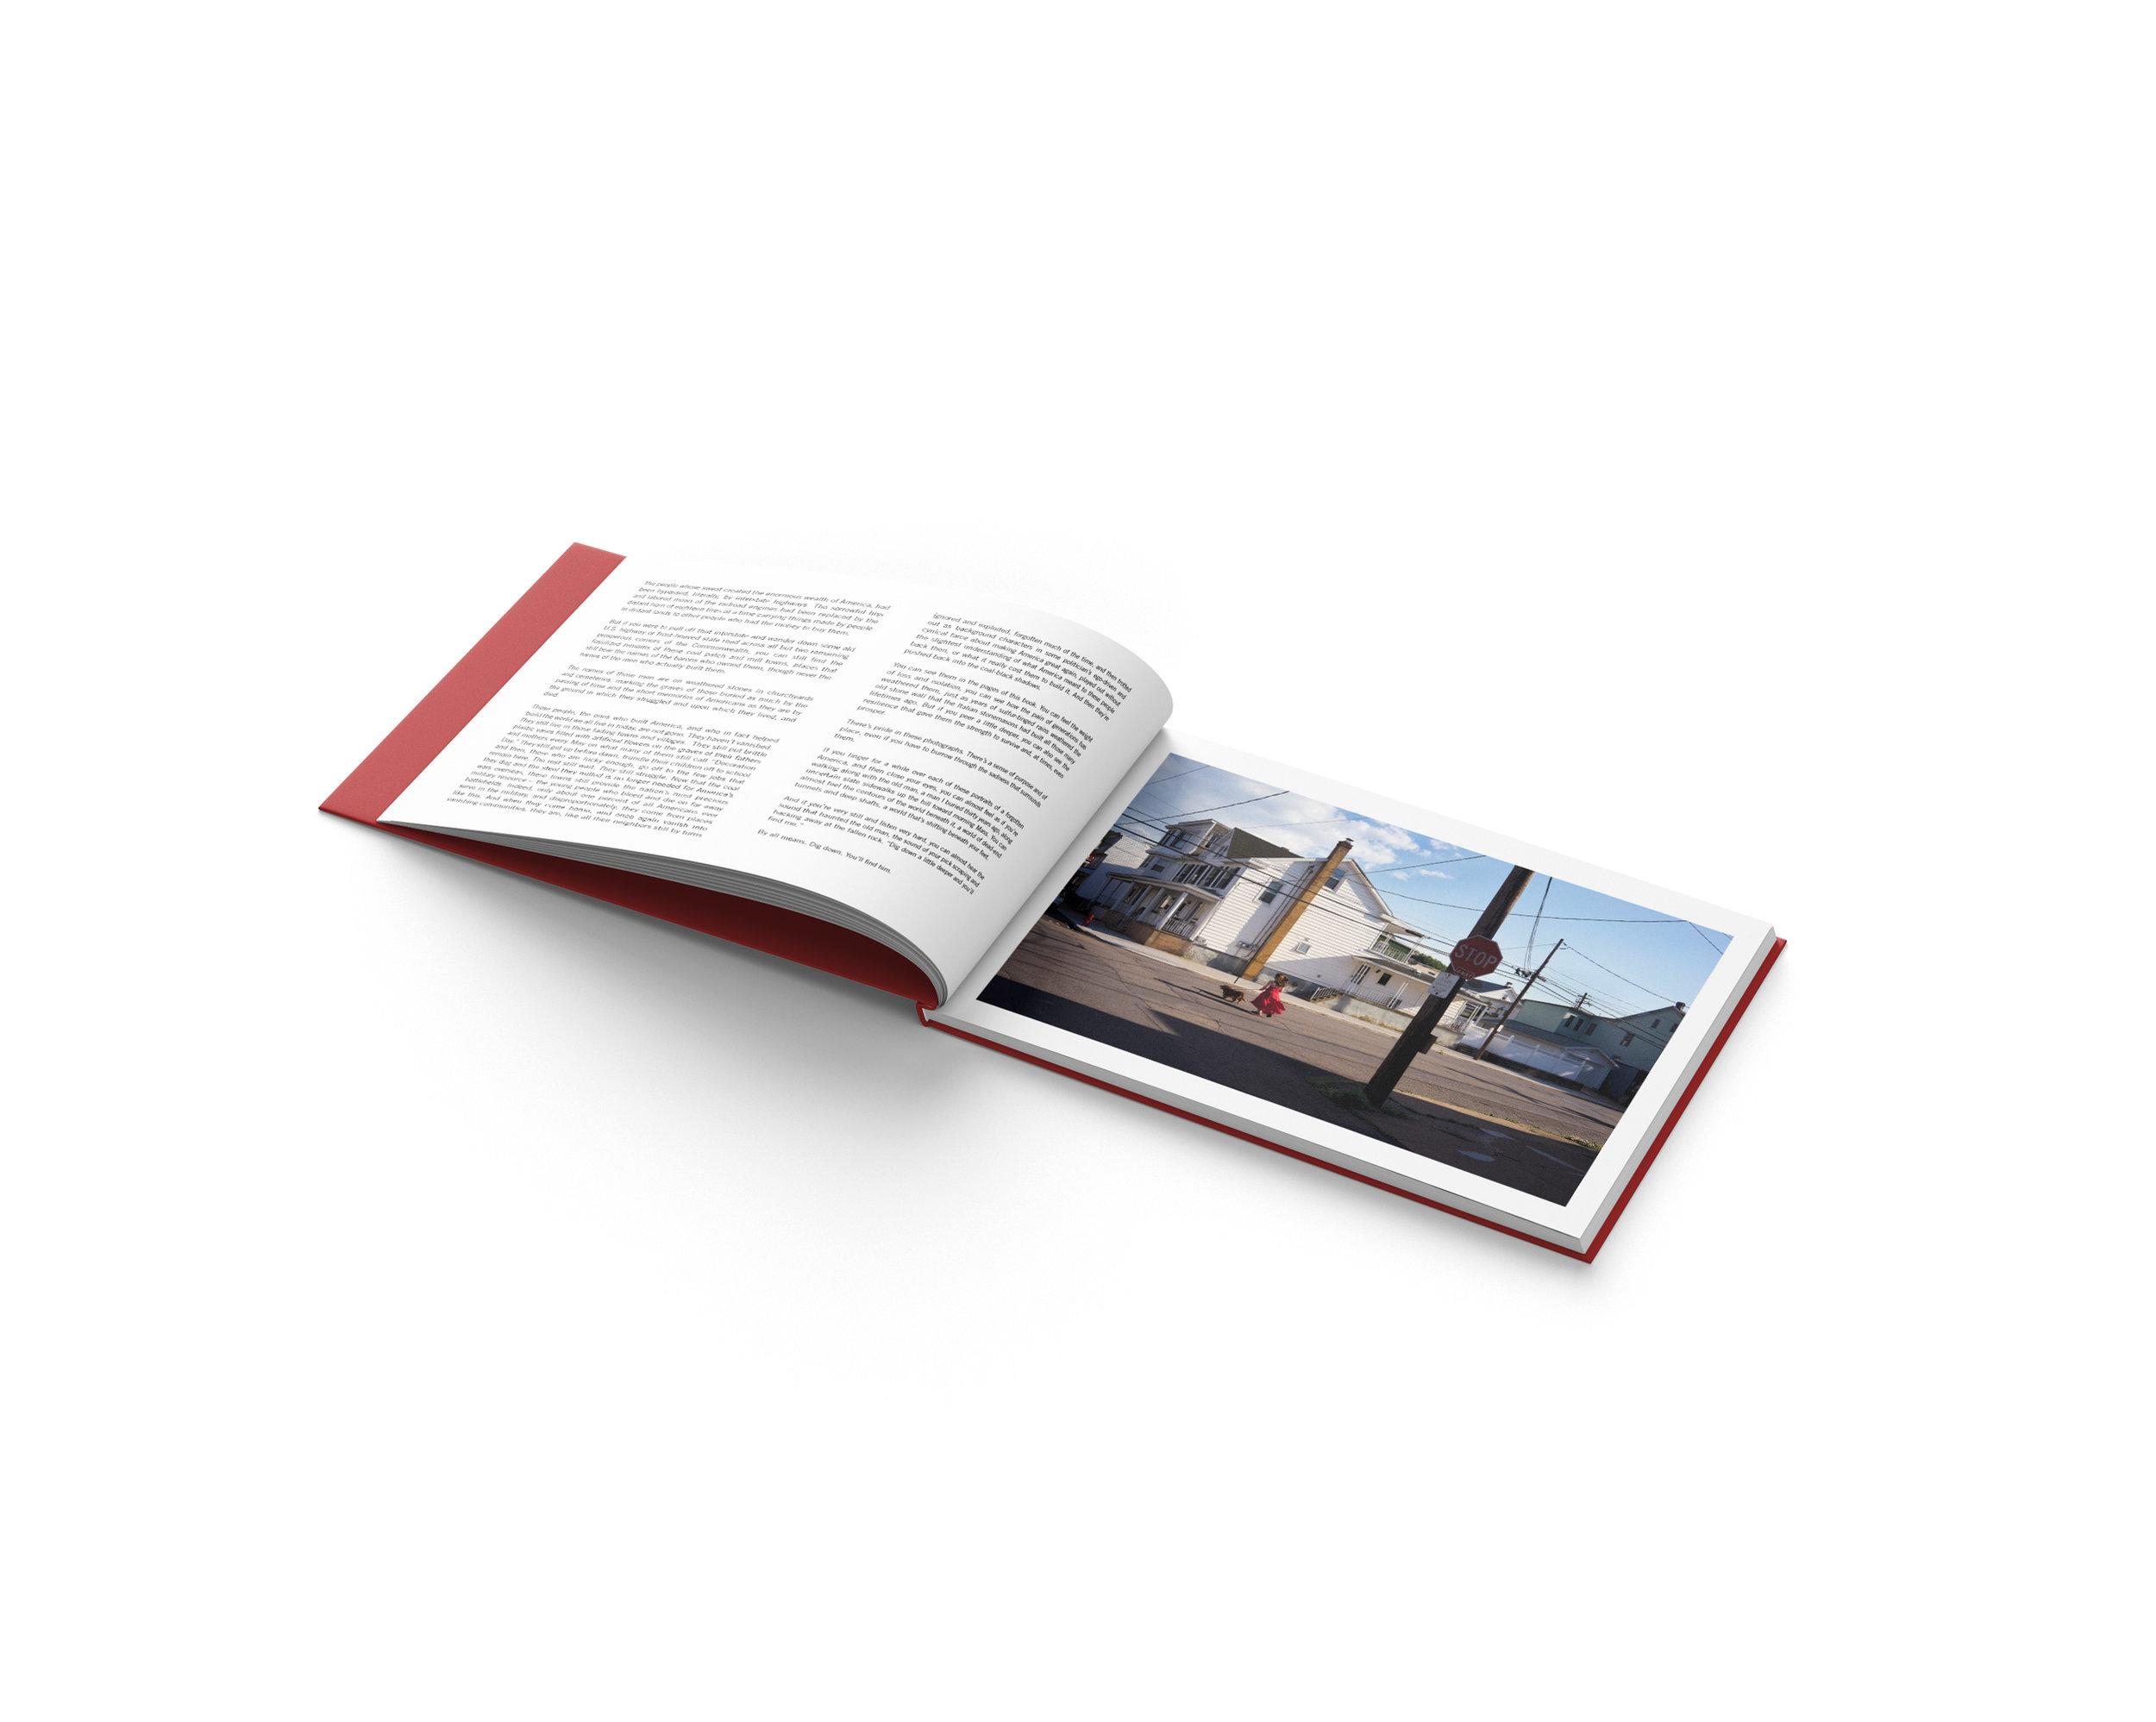 Horizontal_Book_Mockup_2b.jpg